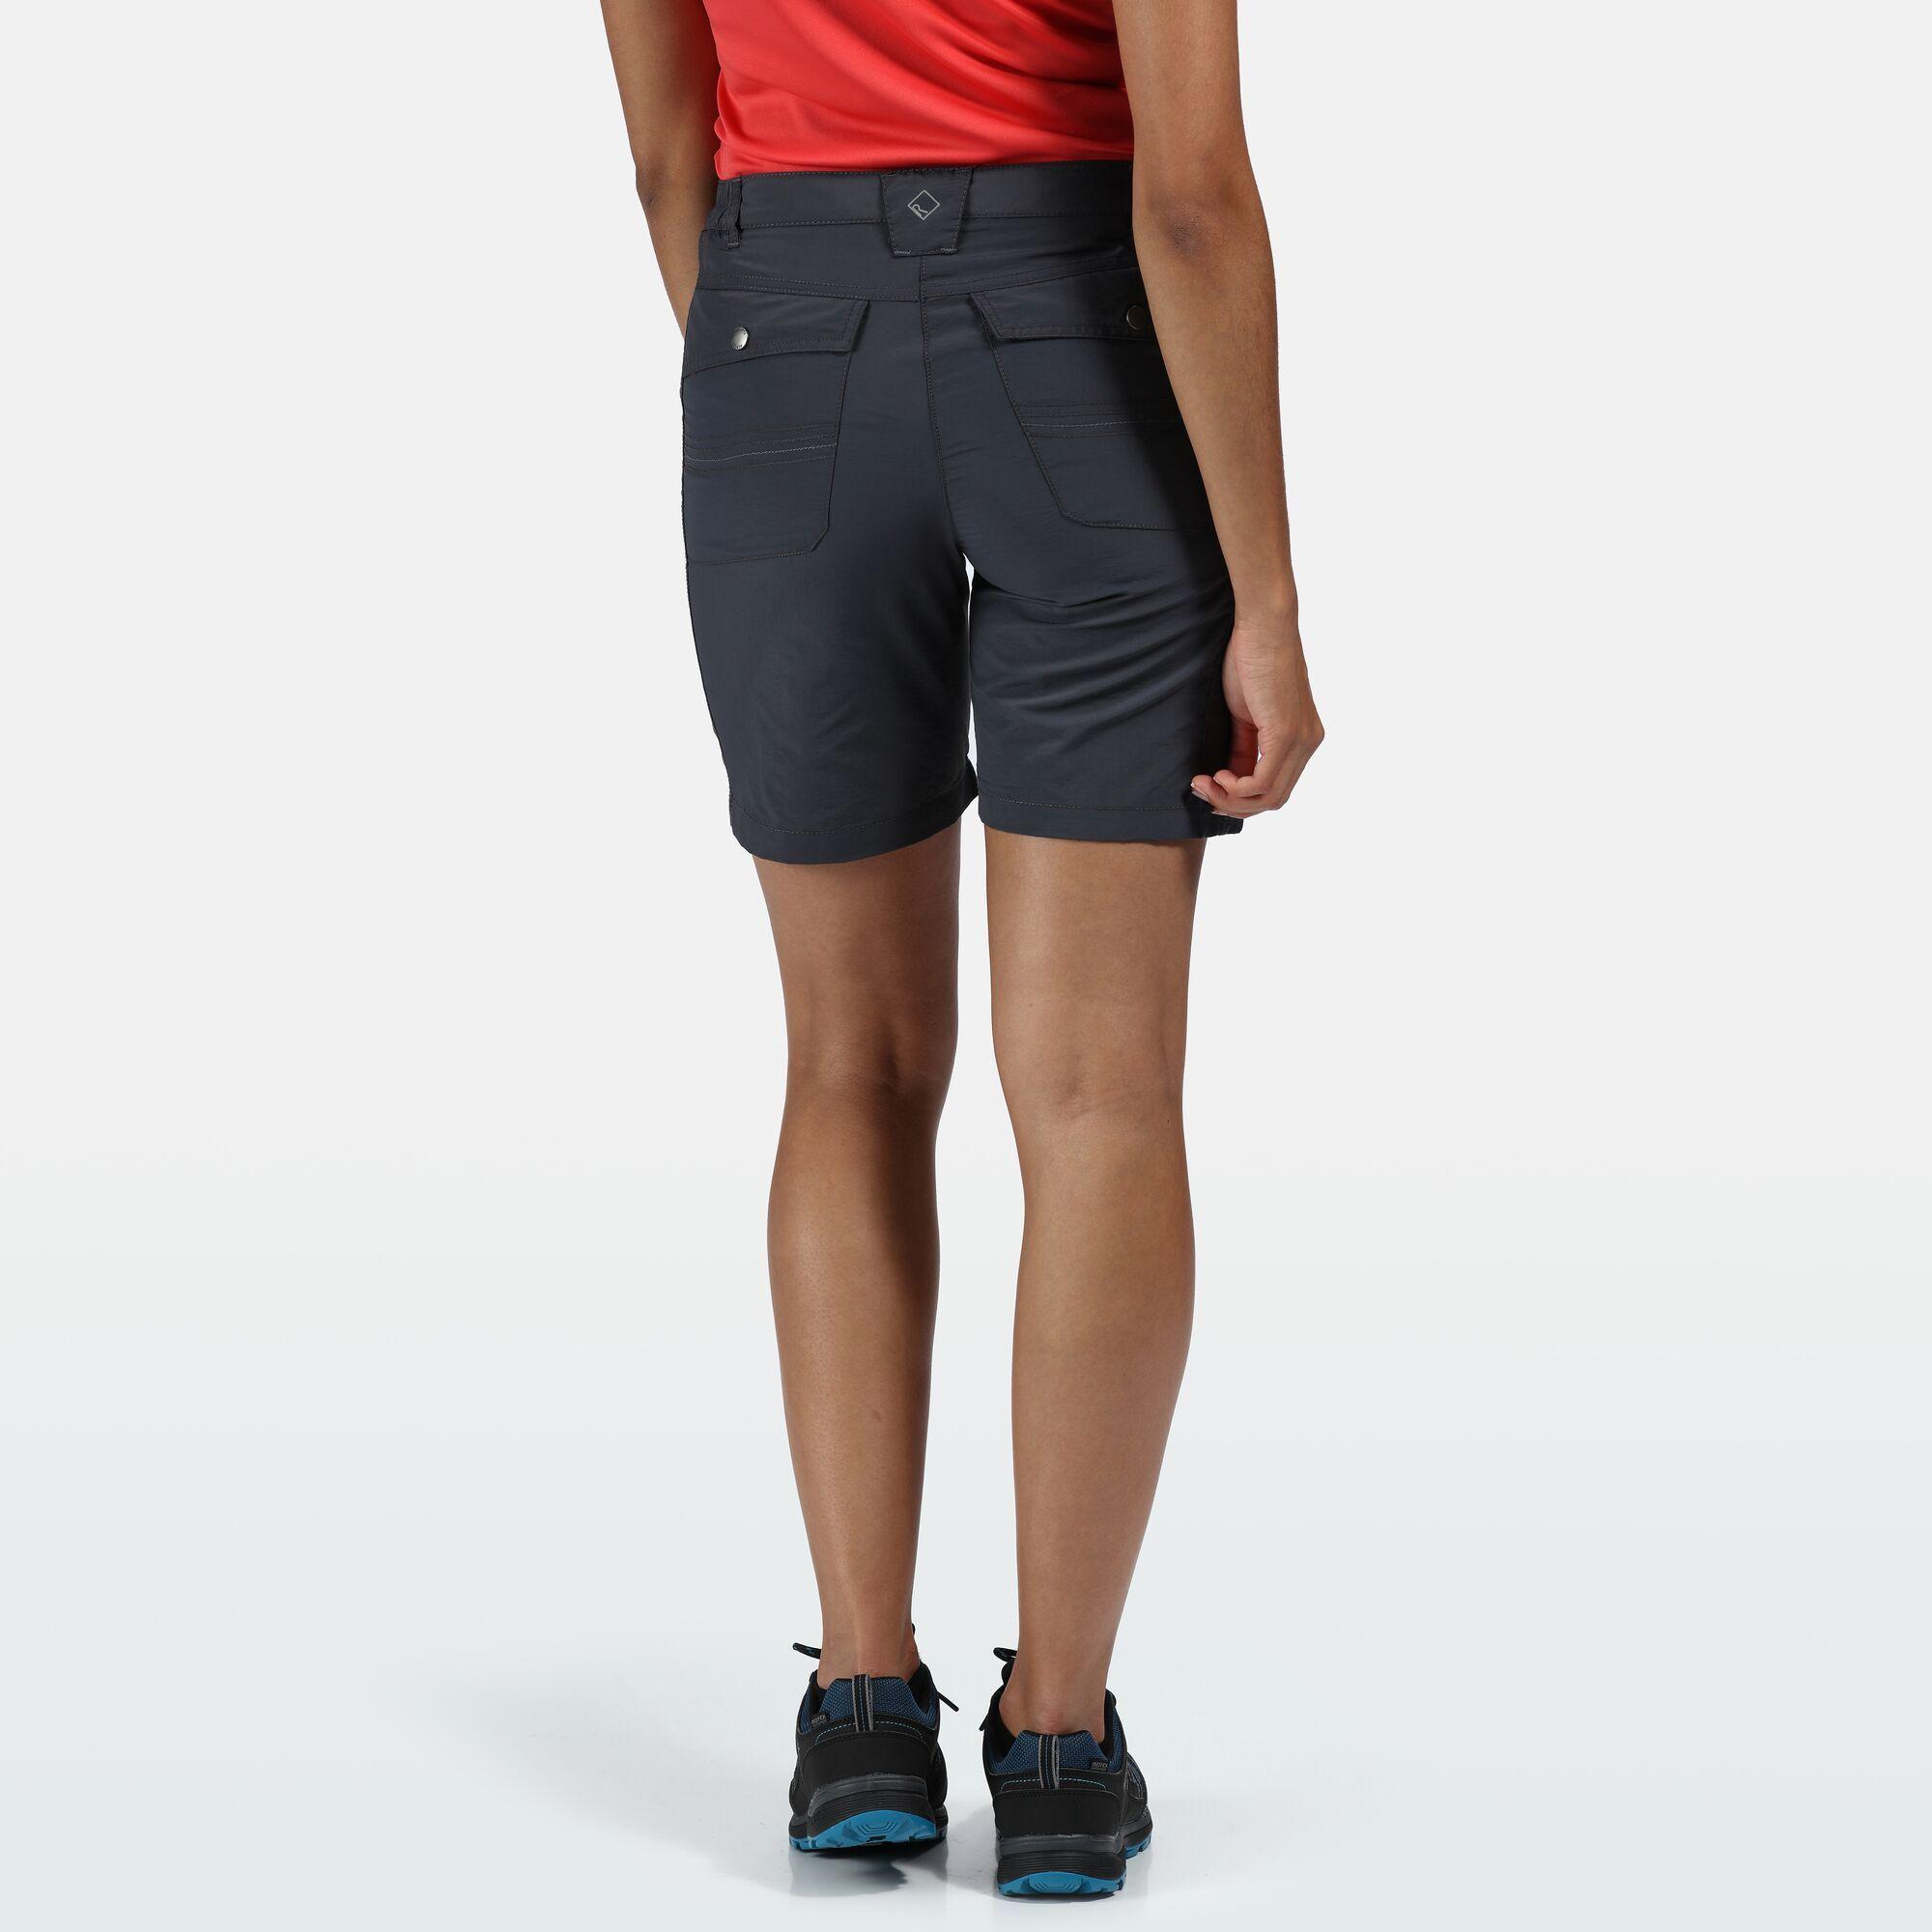 Regatta Womens/Ladies Chaska II Walking Shorts (14 UK) (Turquoise)